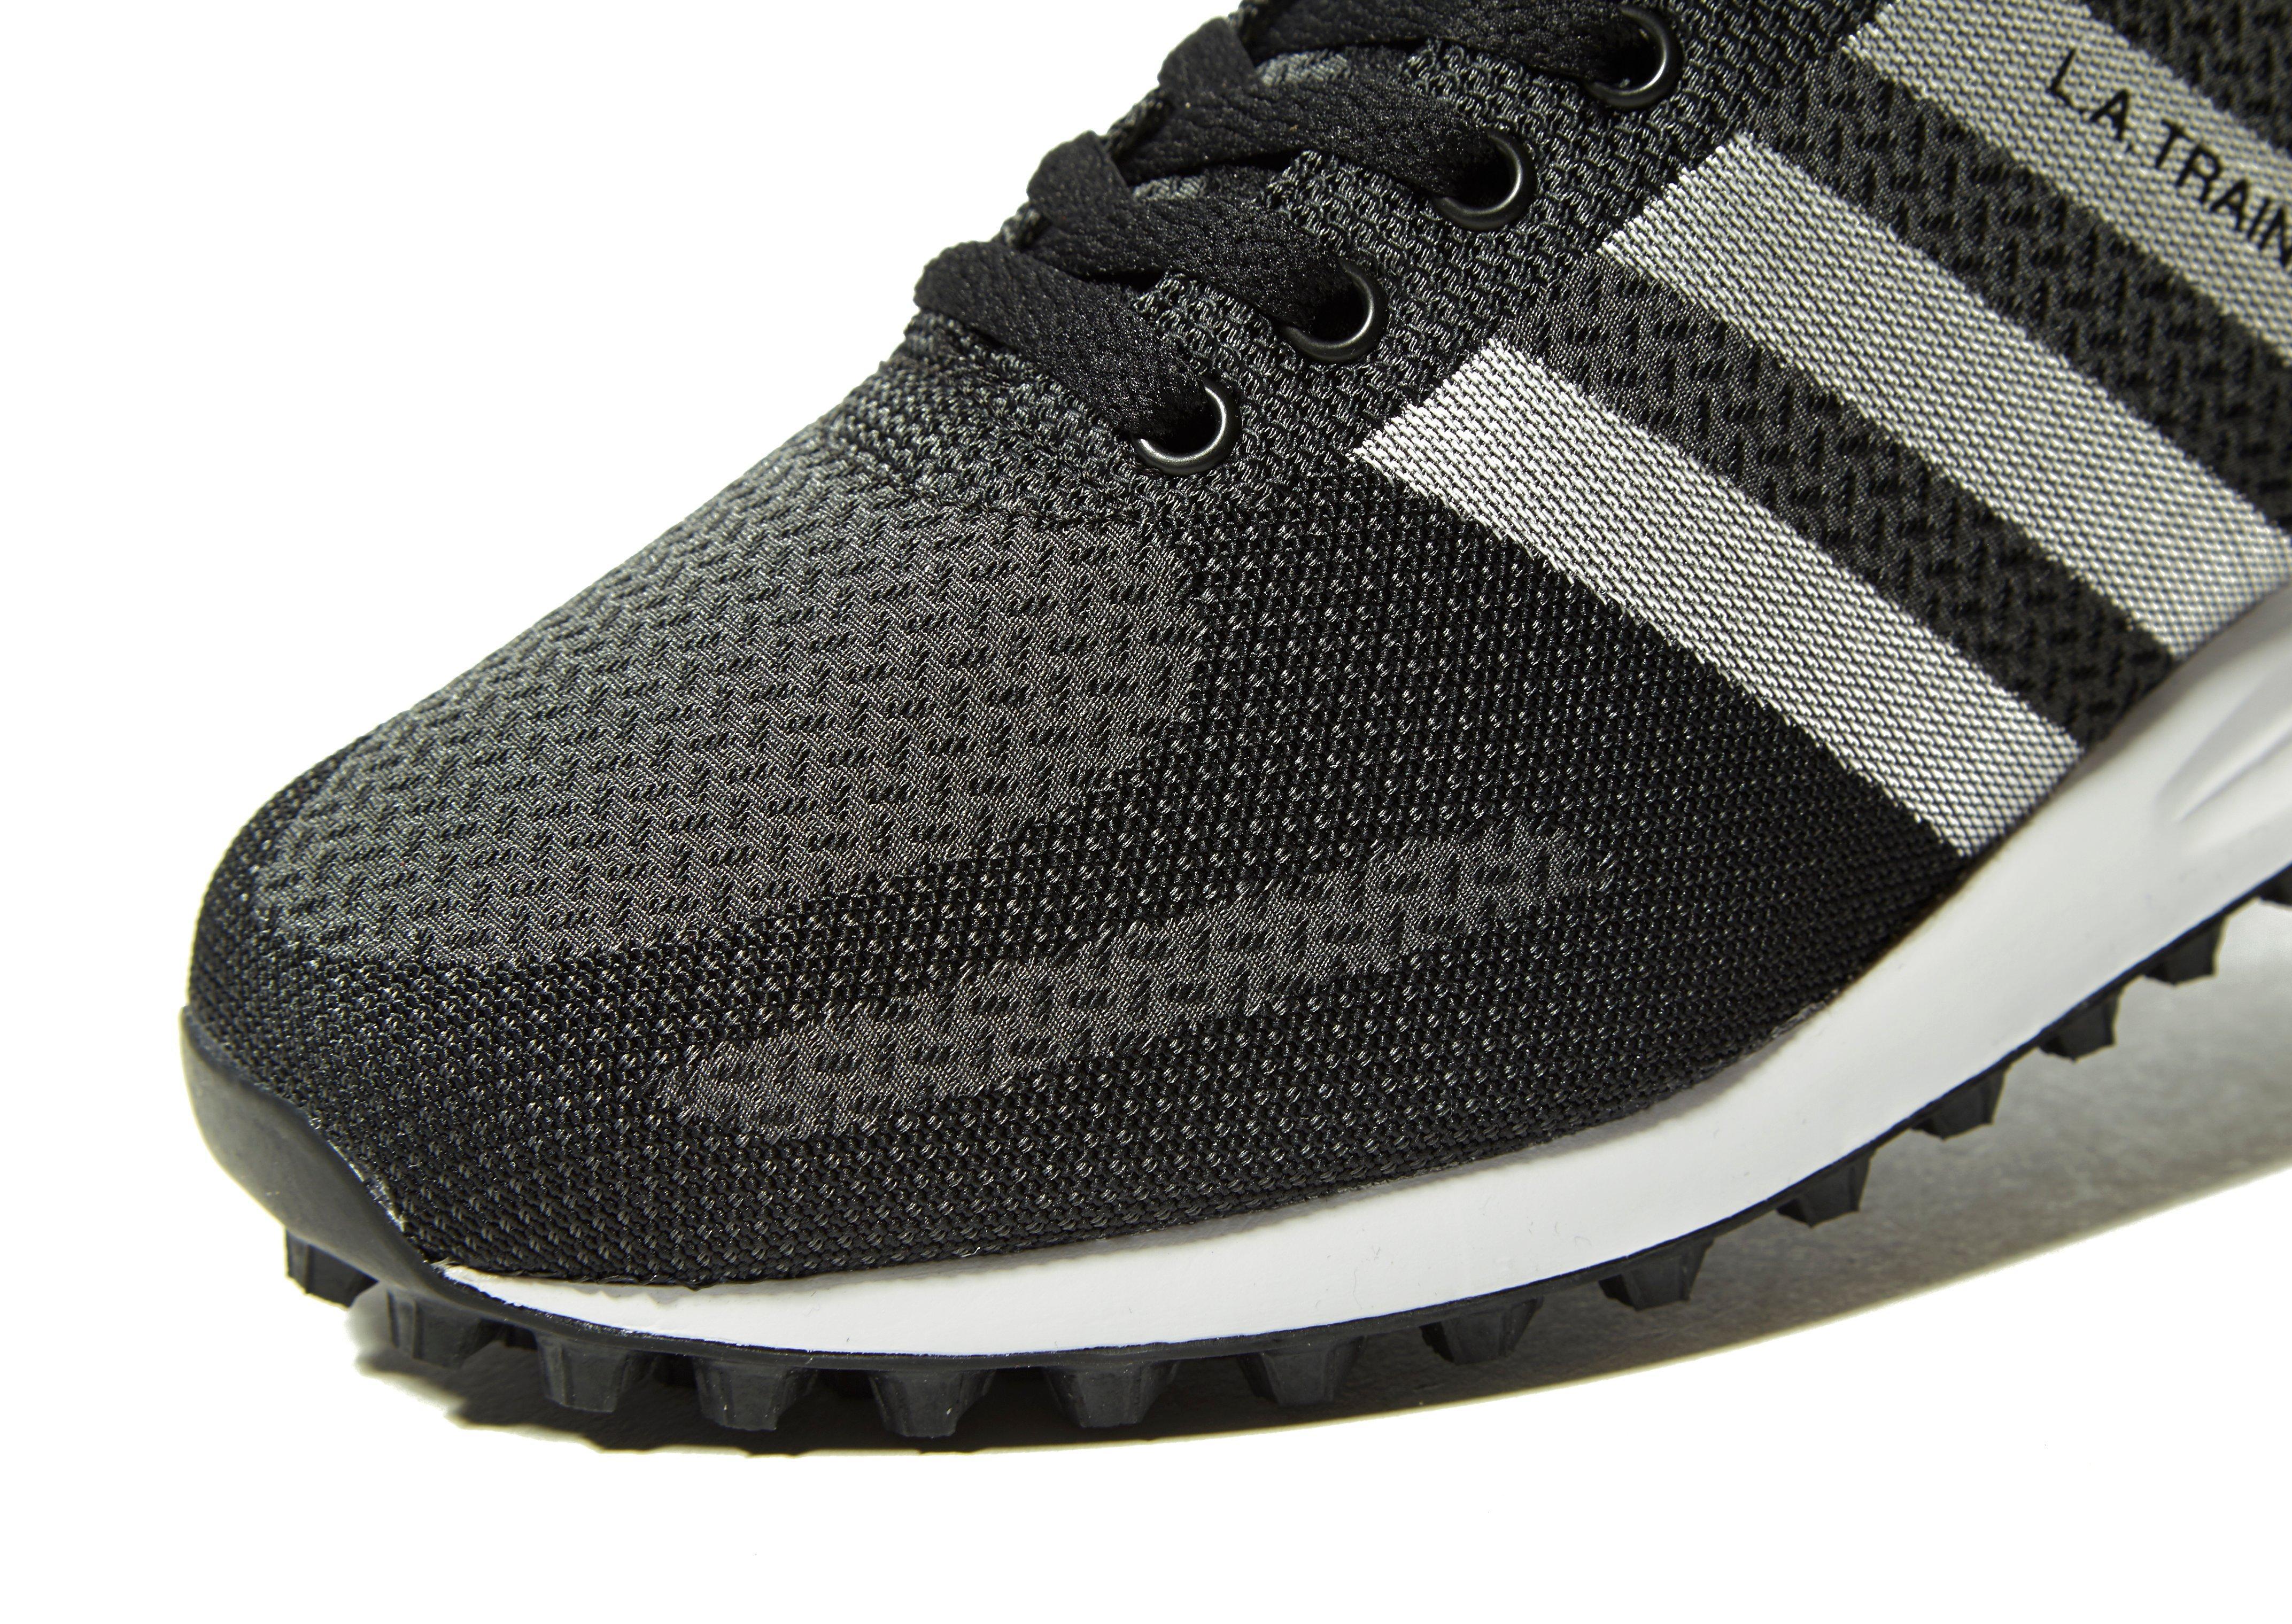 Adidas Originals - Black La Trainer Weave for Men - Lyst. View fullscreen